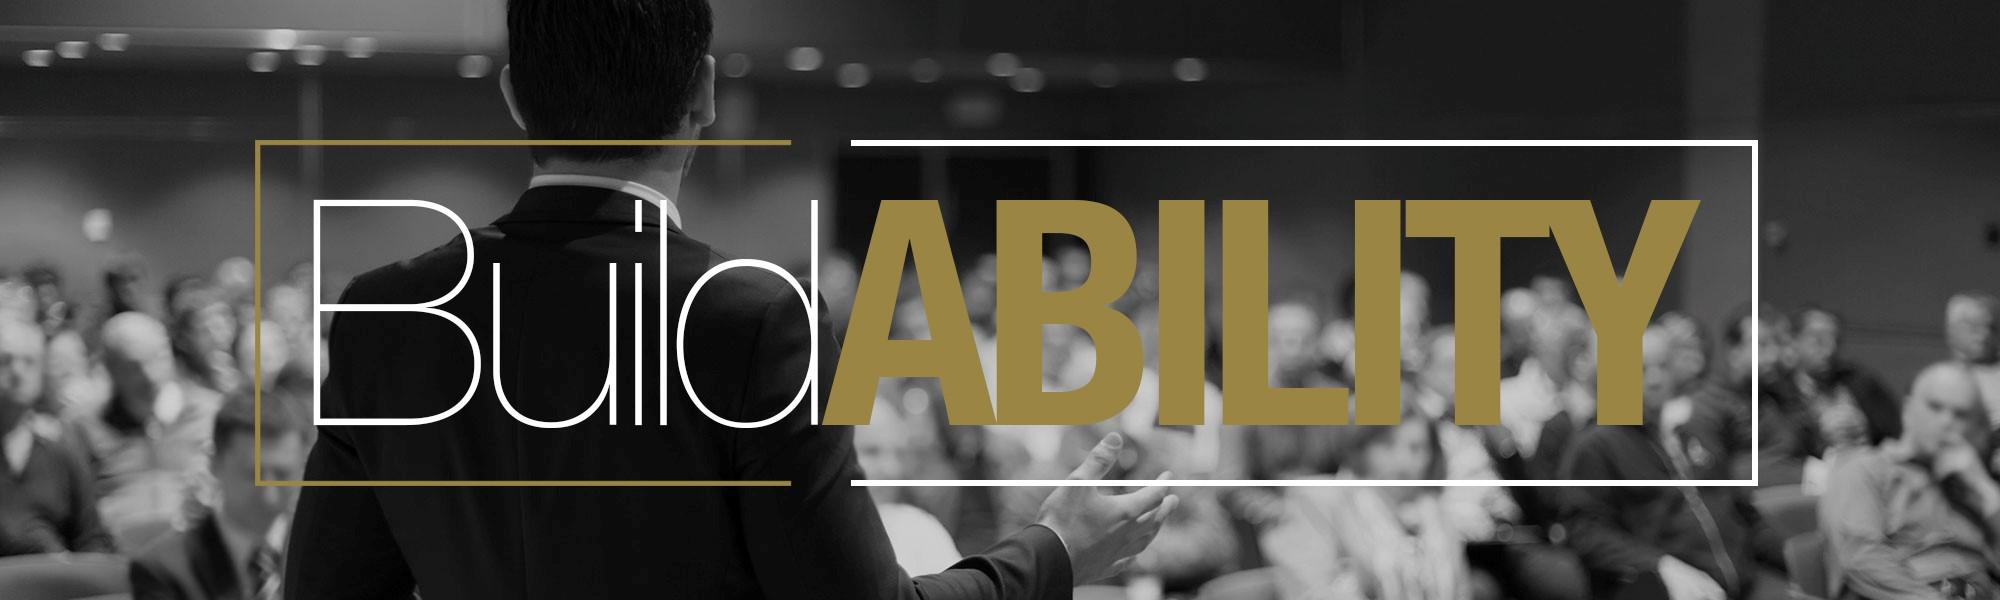 buildability seminar.jpg